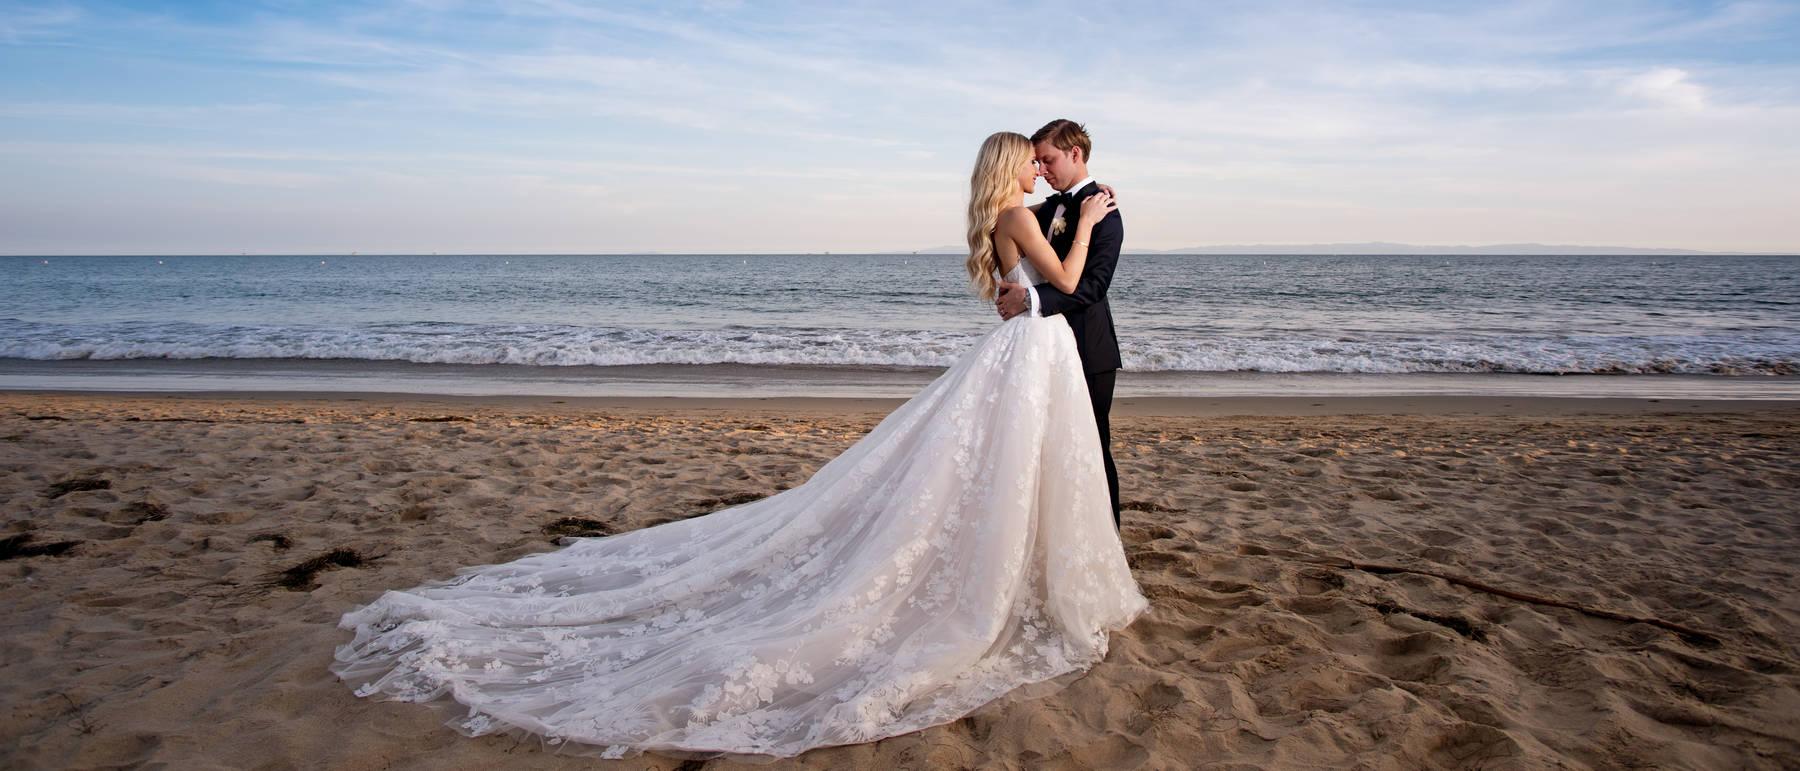 johnandjoseph-wedding-photographer-hz-slider-108